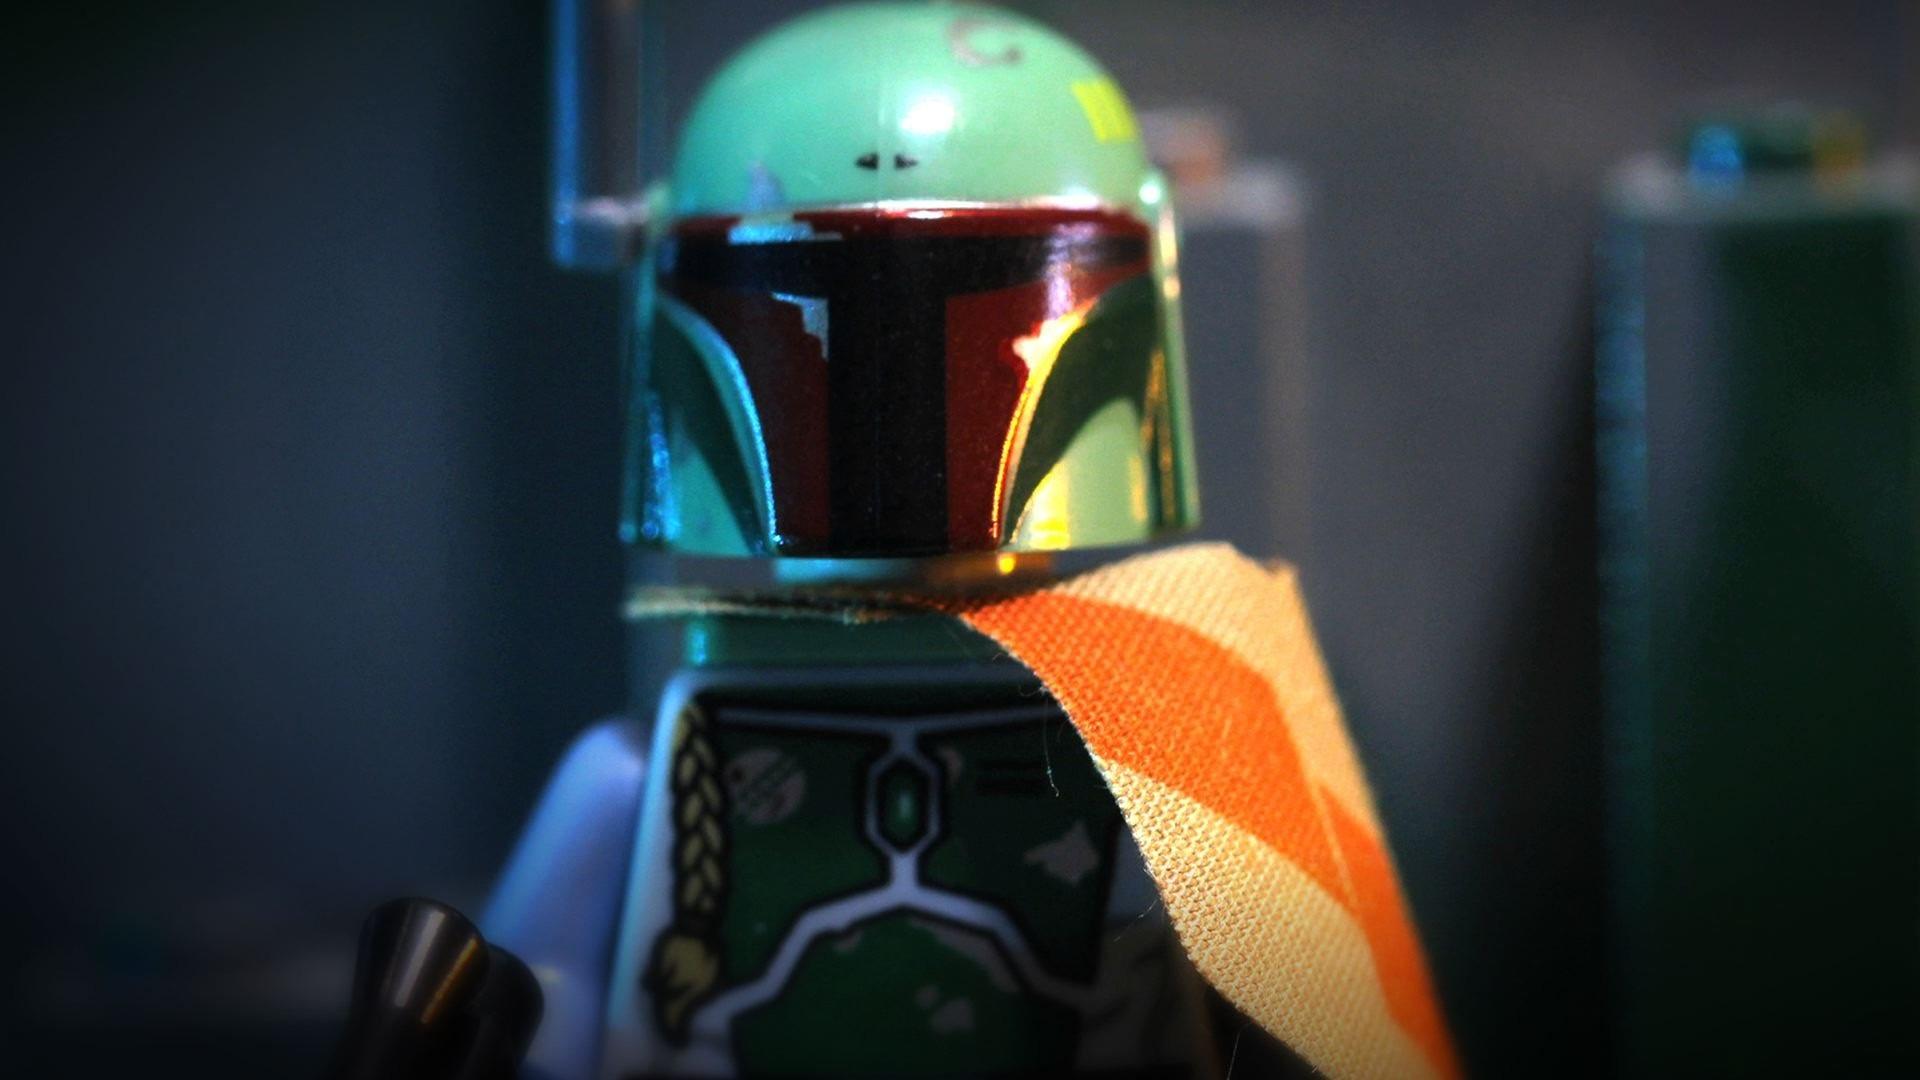 BOBA FETT UNLEASHED (Part 1): A Lego Star Wars Story